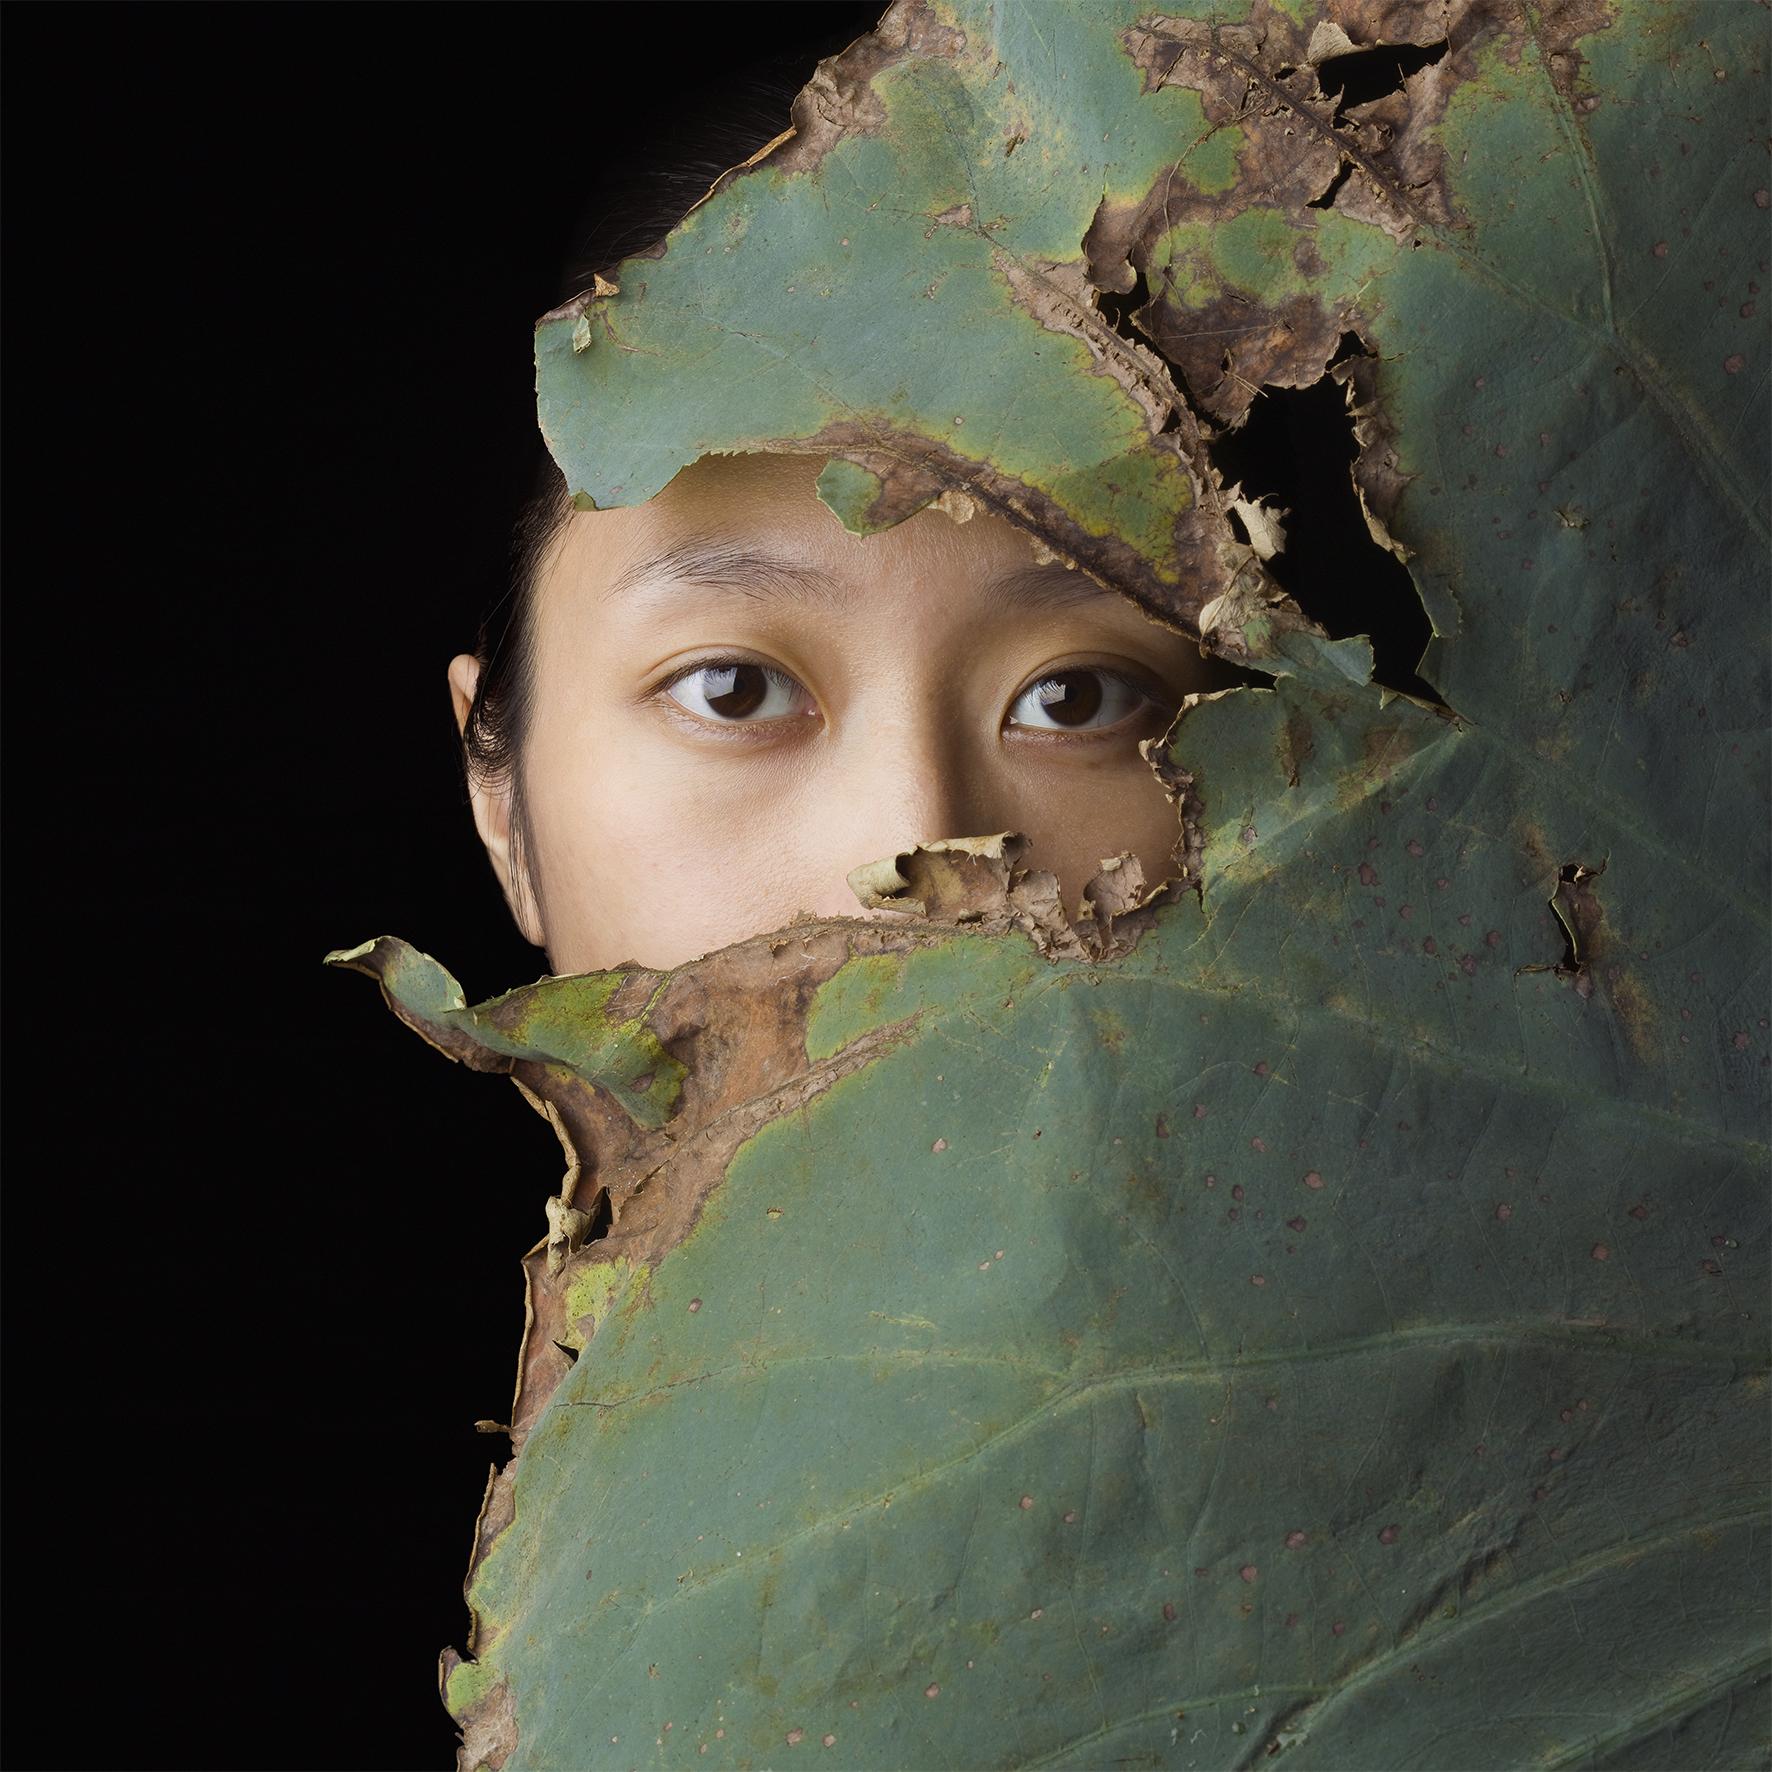 HUYEN - Lotus © Jean-Baptiste HUYNH, 2015